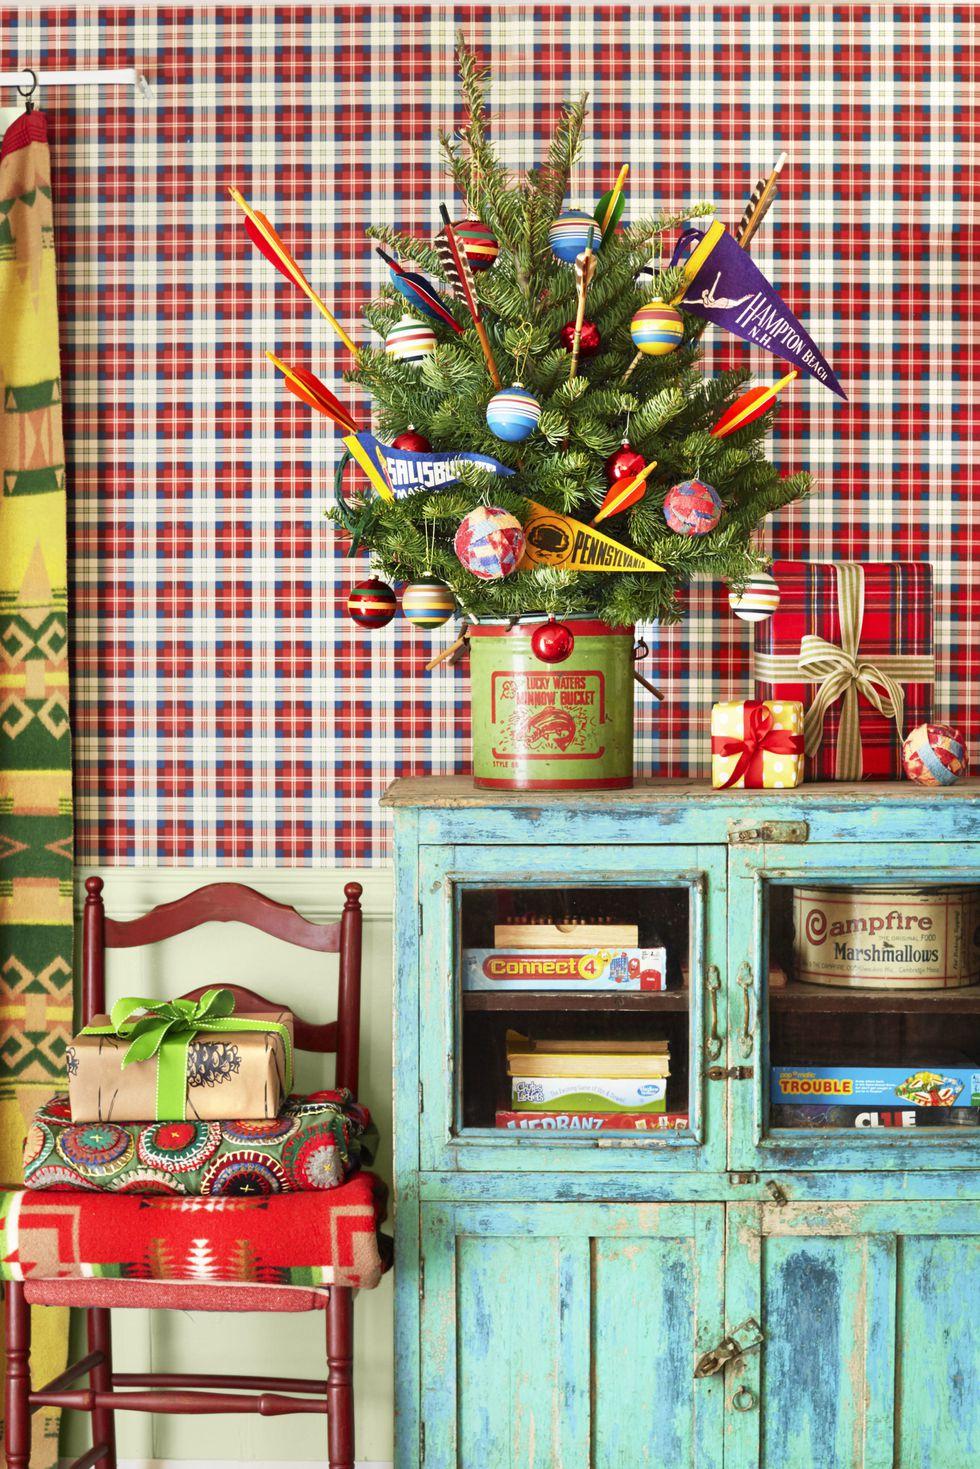 20 Creative Holiday Photo Ideas - Retro Christmas by David Tsay via Country Living | https://www.roseclearfield.com